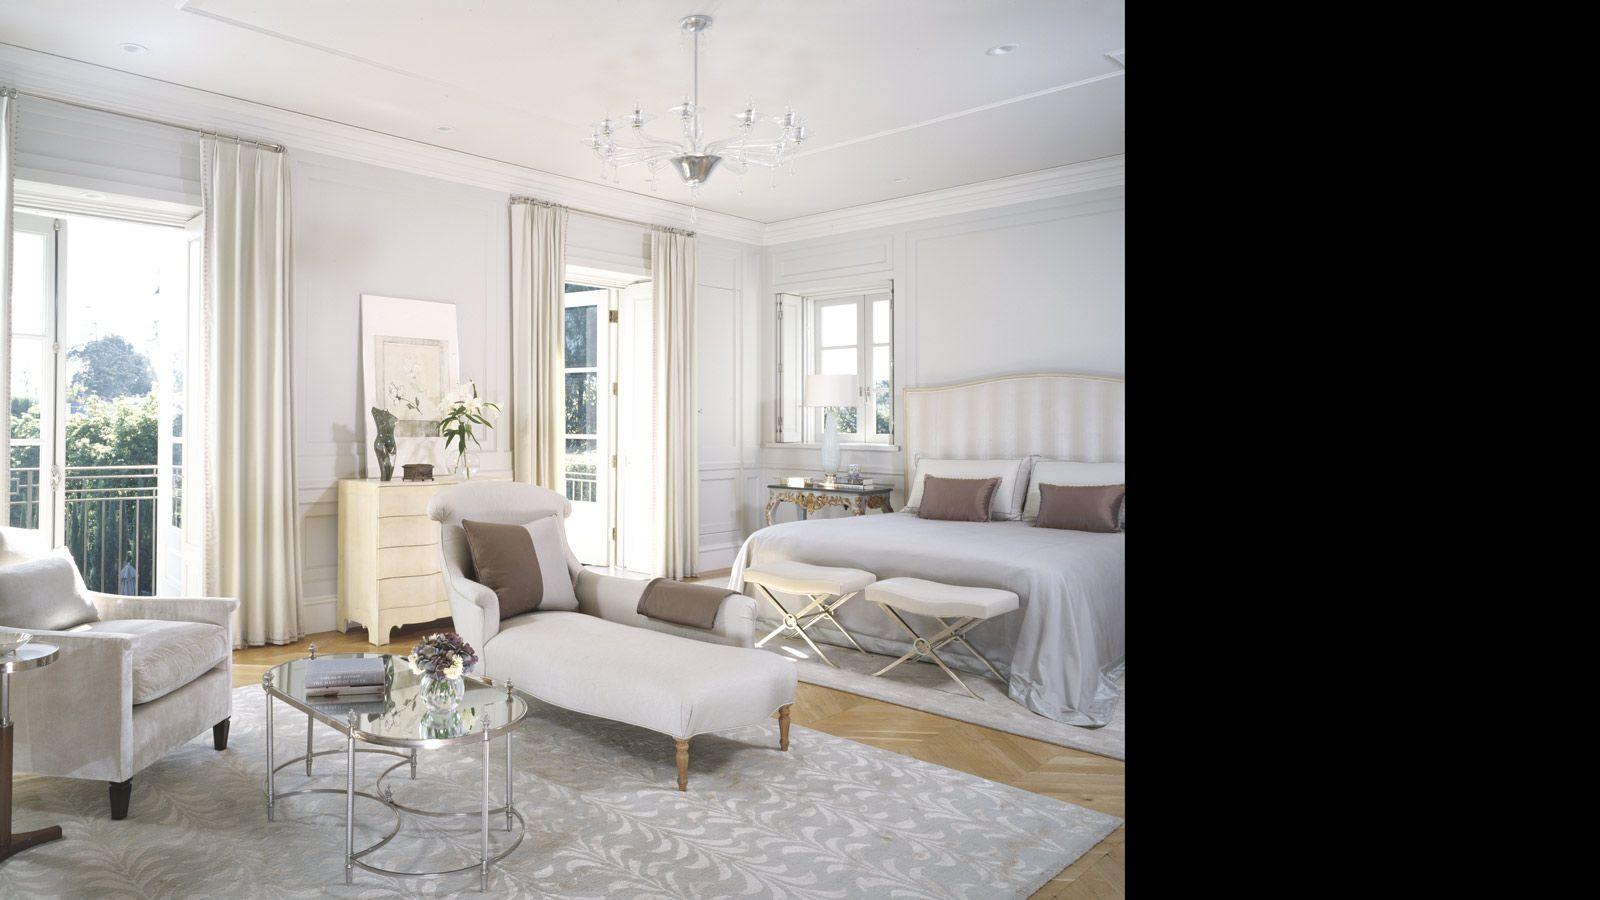 dream master bedroom%0A William Hefner Architecture Interiors  u     Landscape  traditional  bedroom   los angeles  by Studio William Hefner